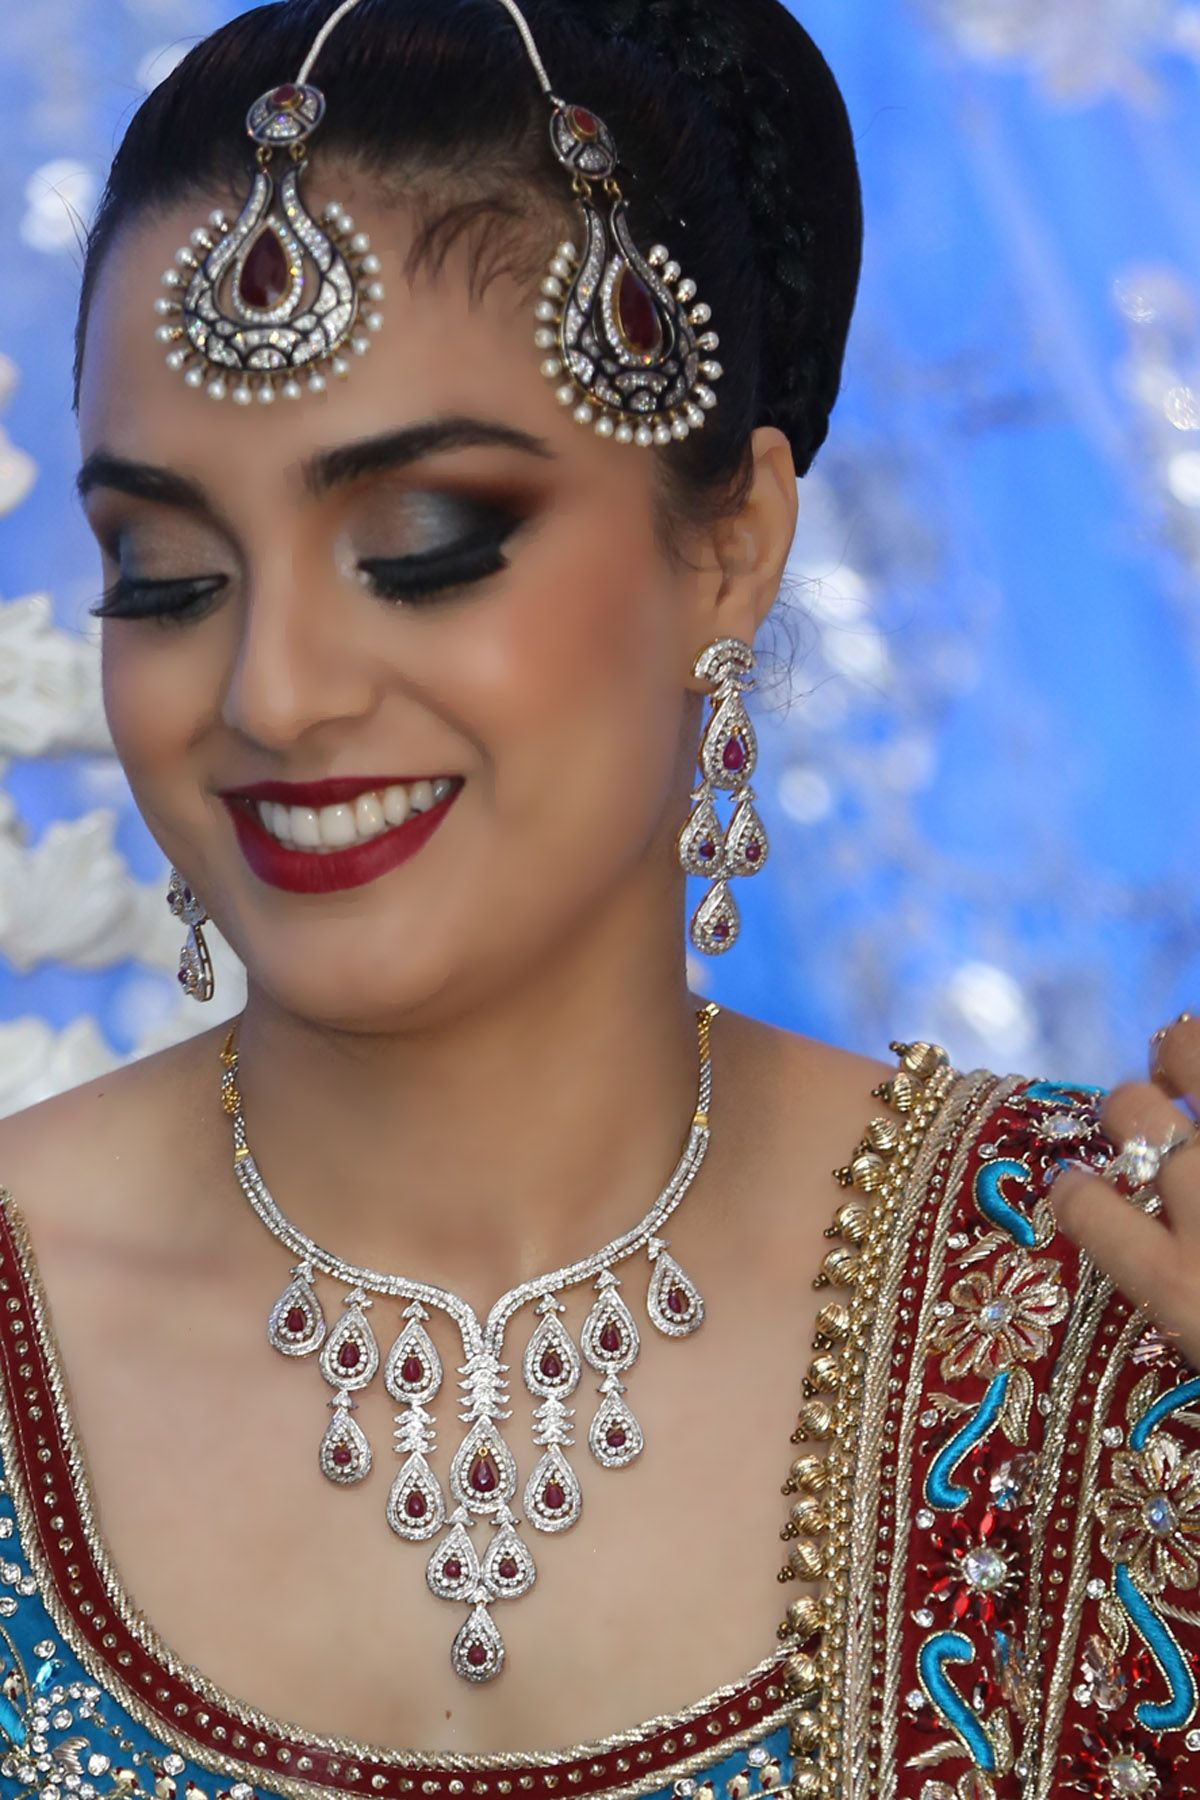 Bridal Makeup Artist Toronto Ms Studio Make Up And Hair Studio Soooo Pretty And It Is A Bold Look But Bridal Makeup Desi Bridal Makeup Best Bridal Makeup